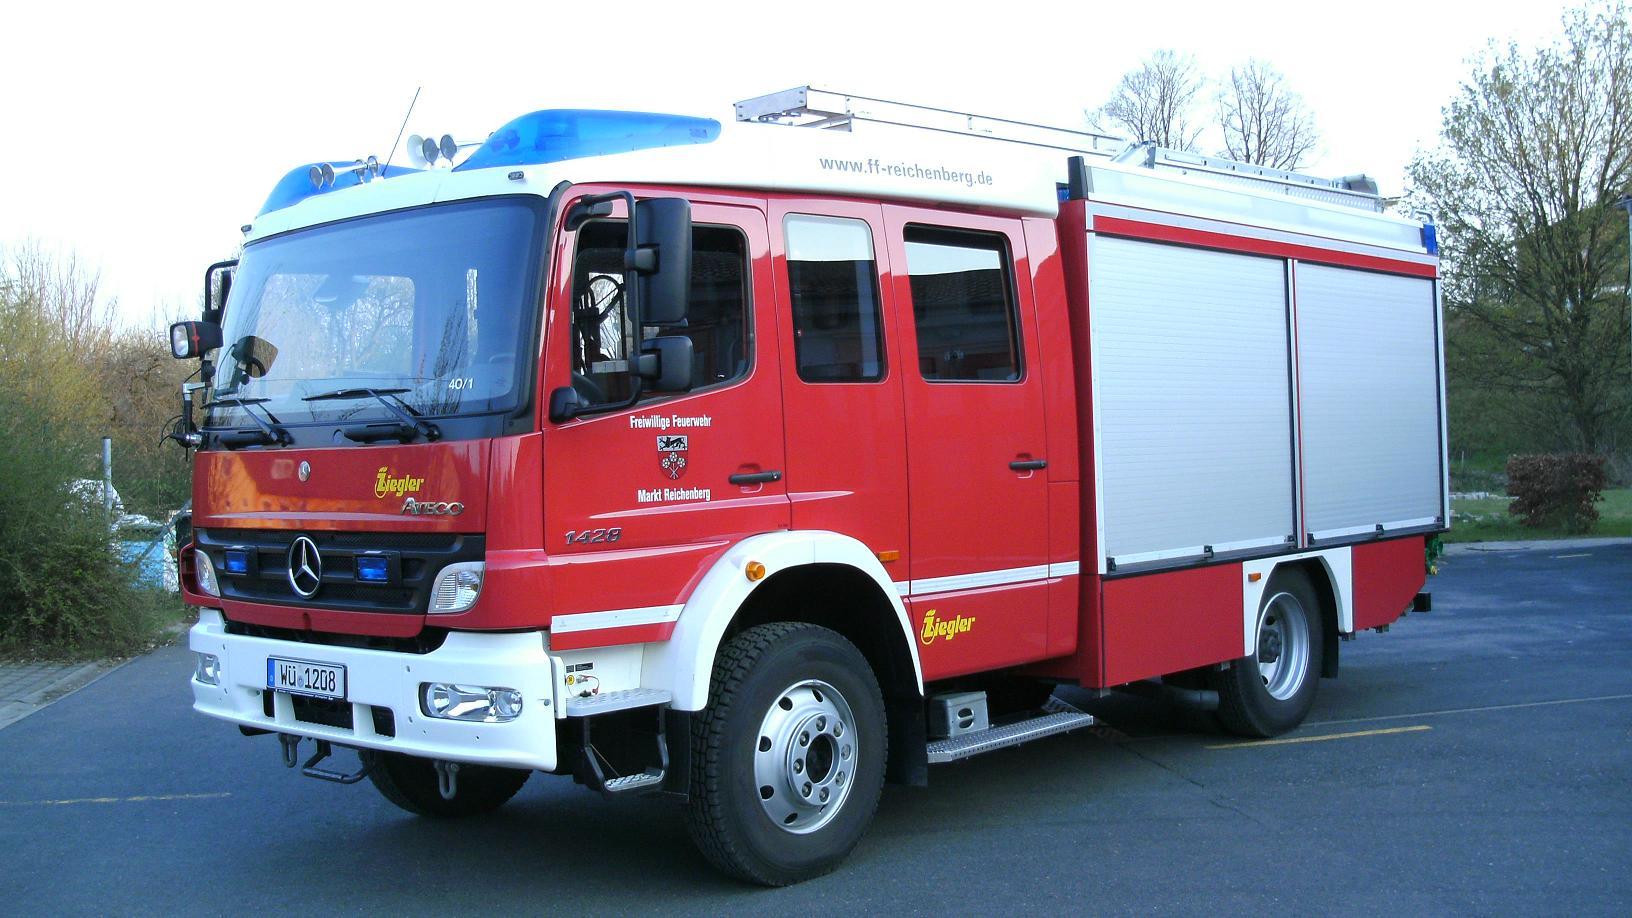 HLF - 40/1